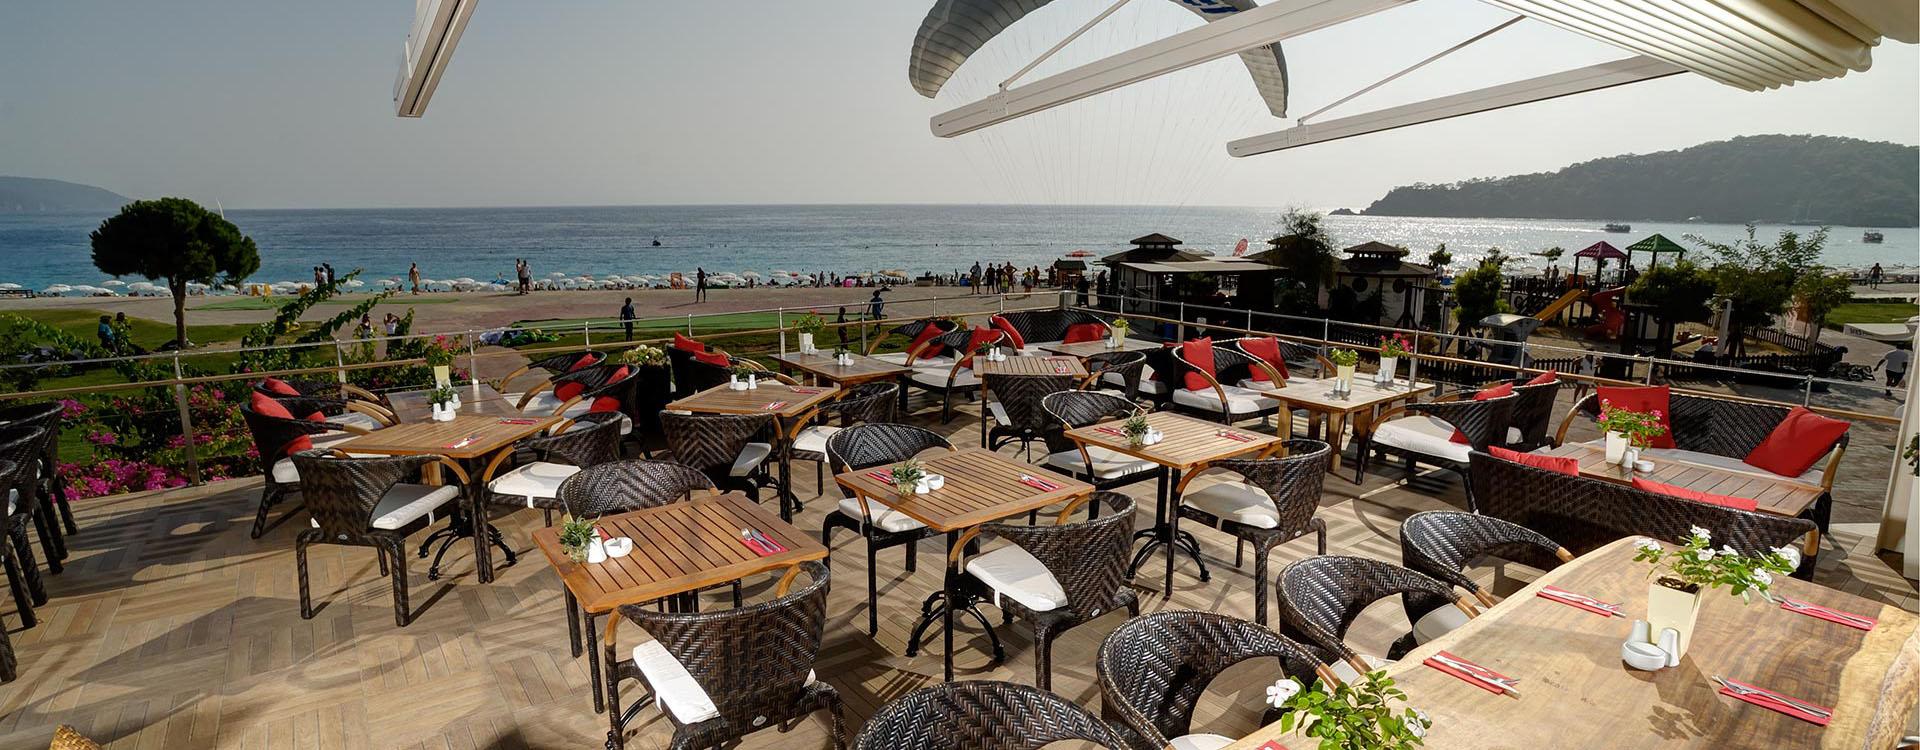 Hangout Restaurant Fethiye Oludeniz beach